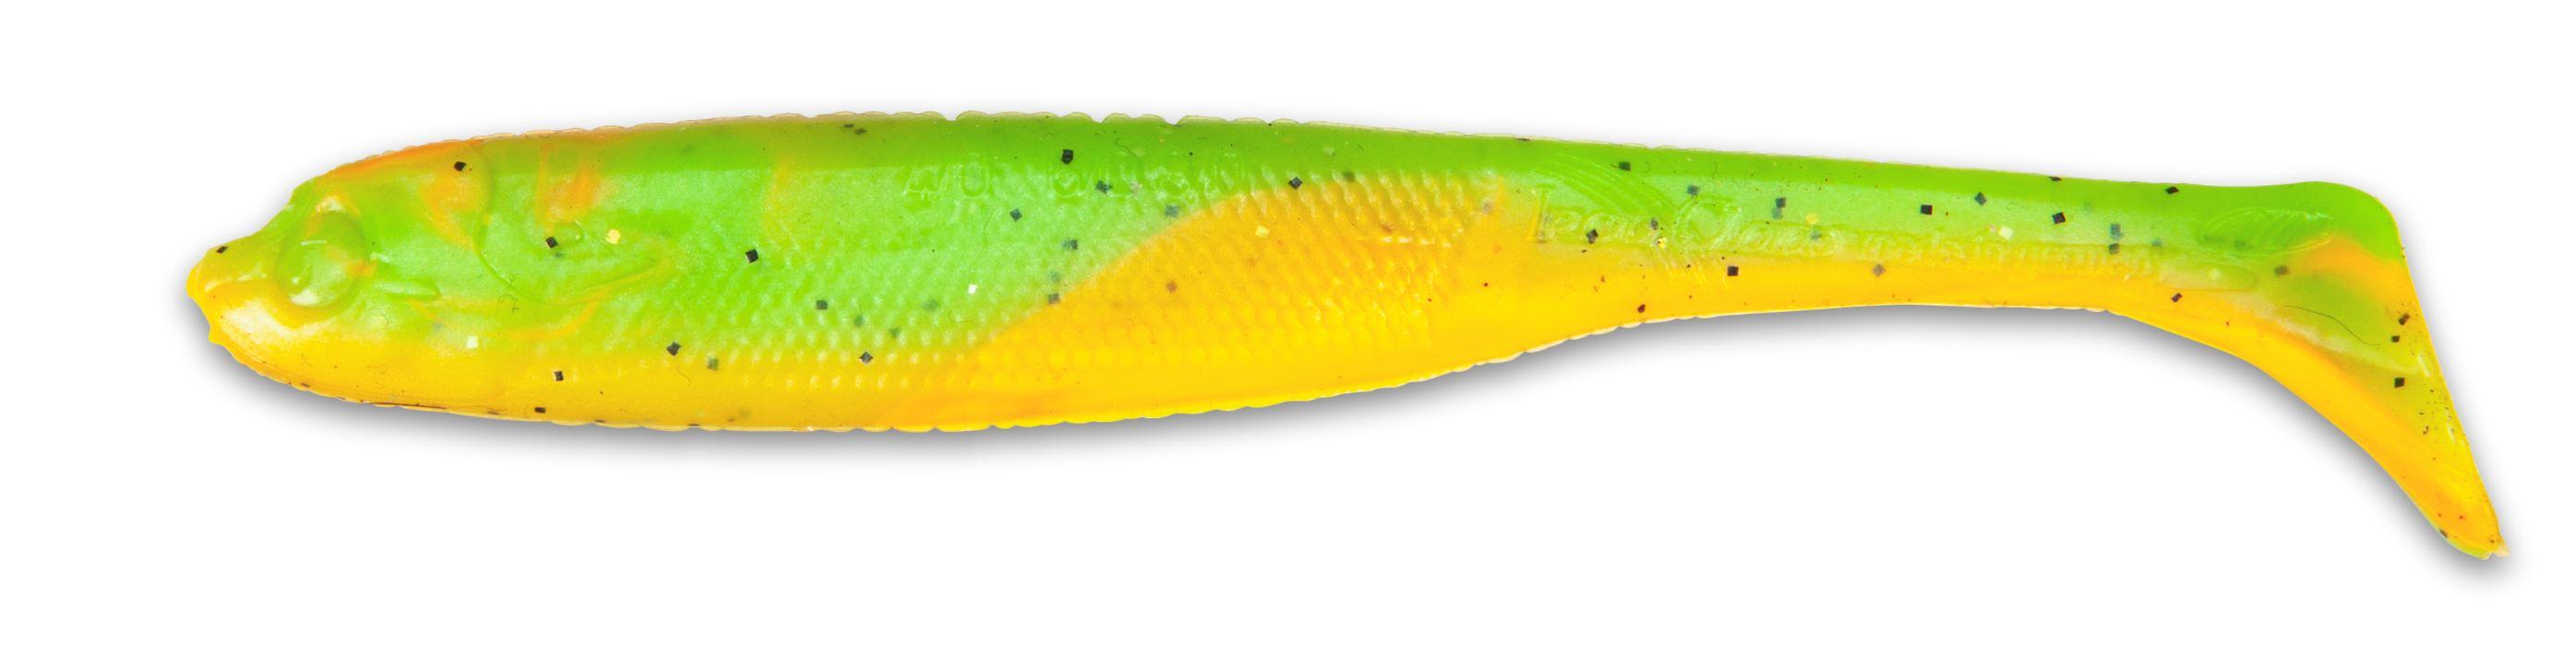 Iron Claw nástraha Slim Jim Non Toxic 7 cm Vzor RFT